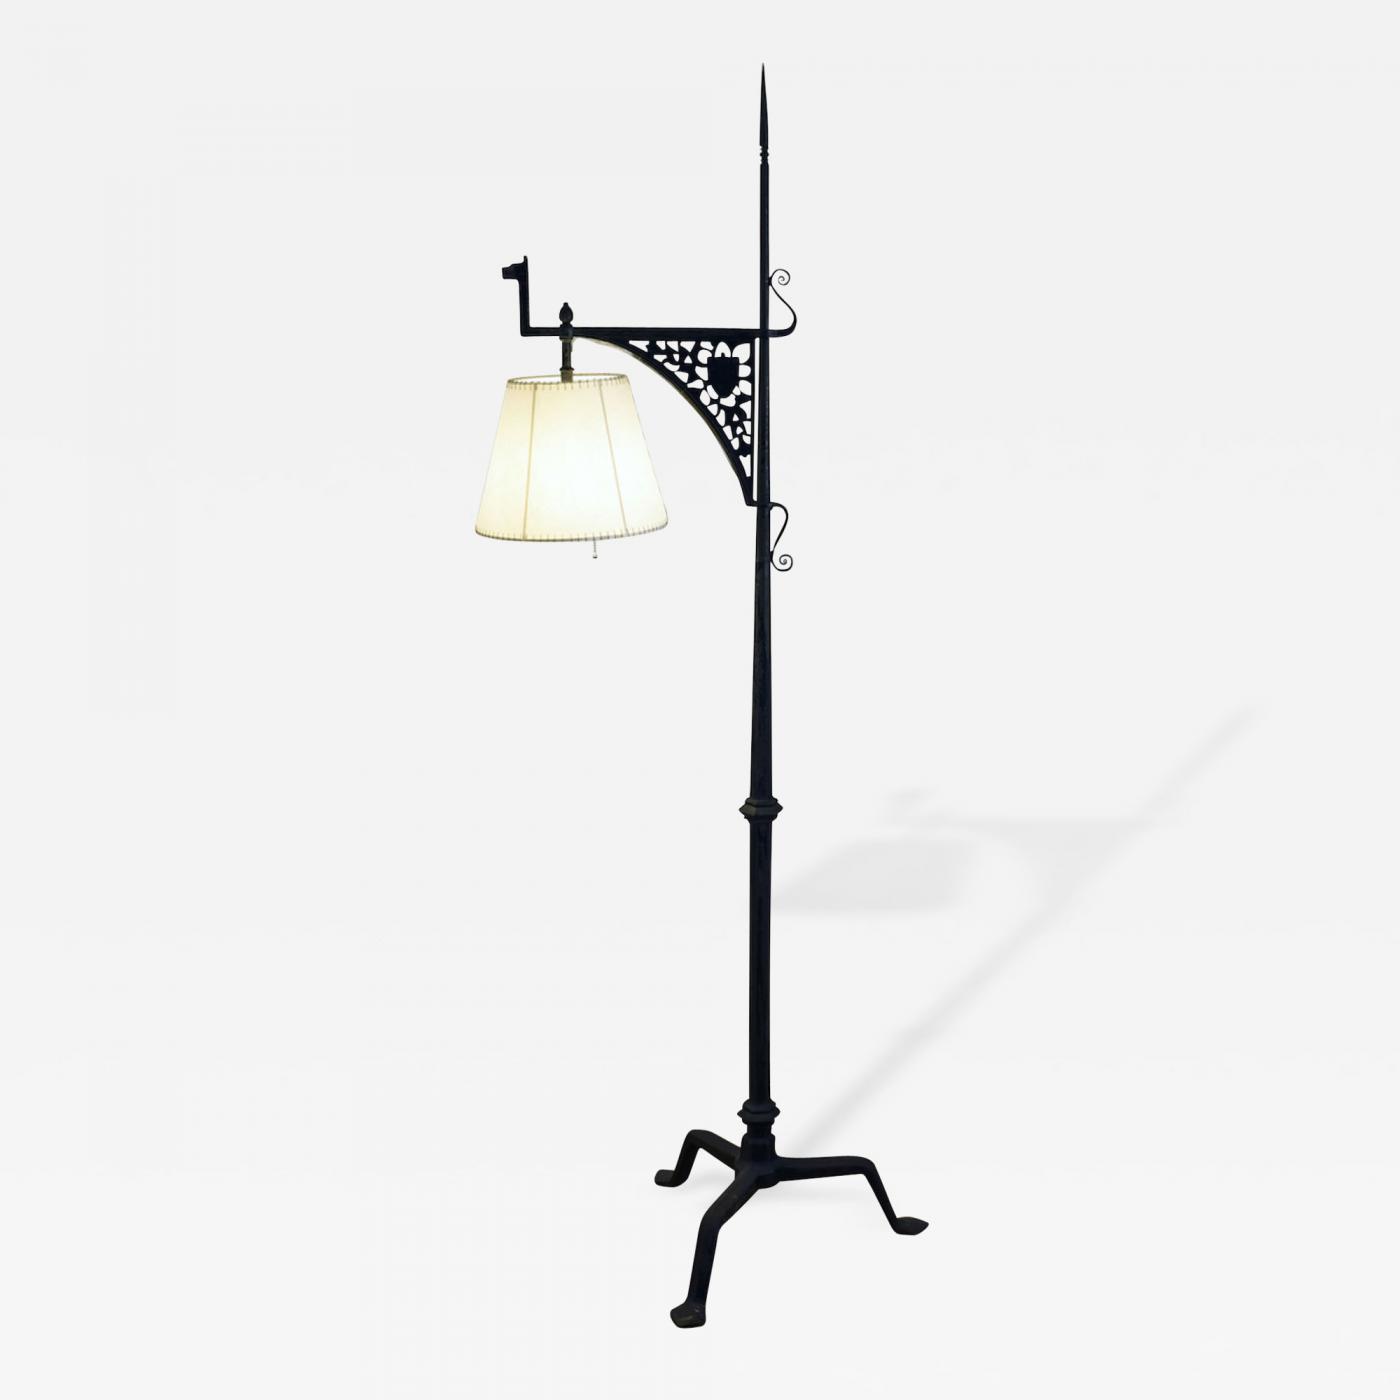 Samuel yellin gothic floor lamp listings furniture lighting floor lamps mozeypictures Images